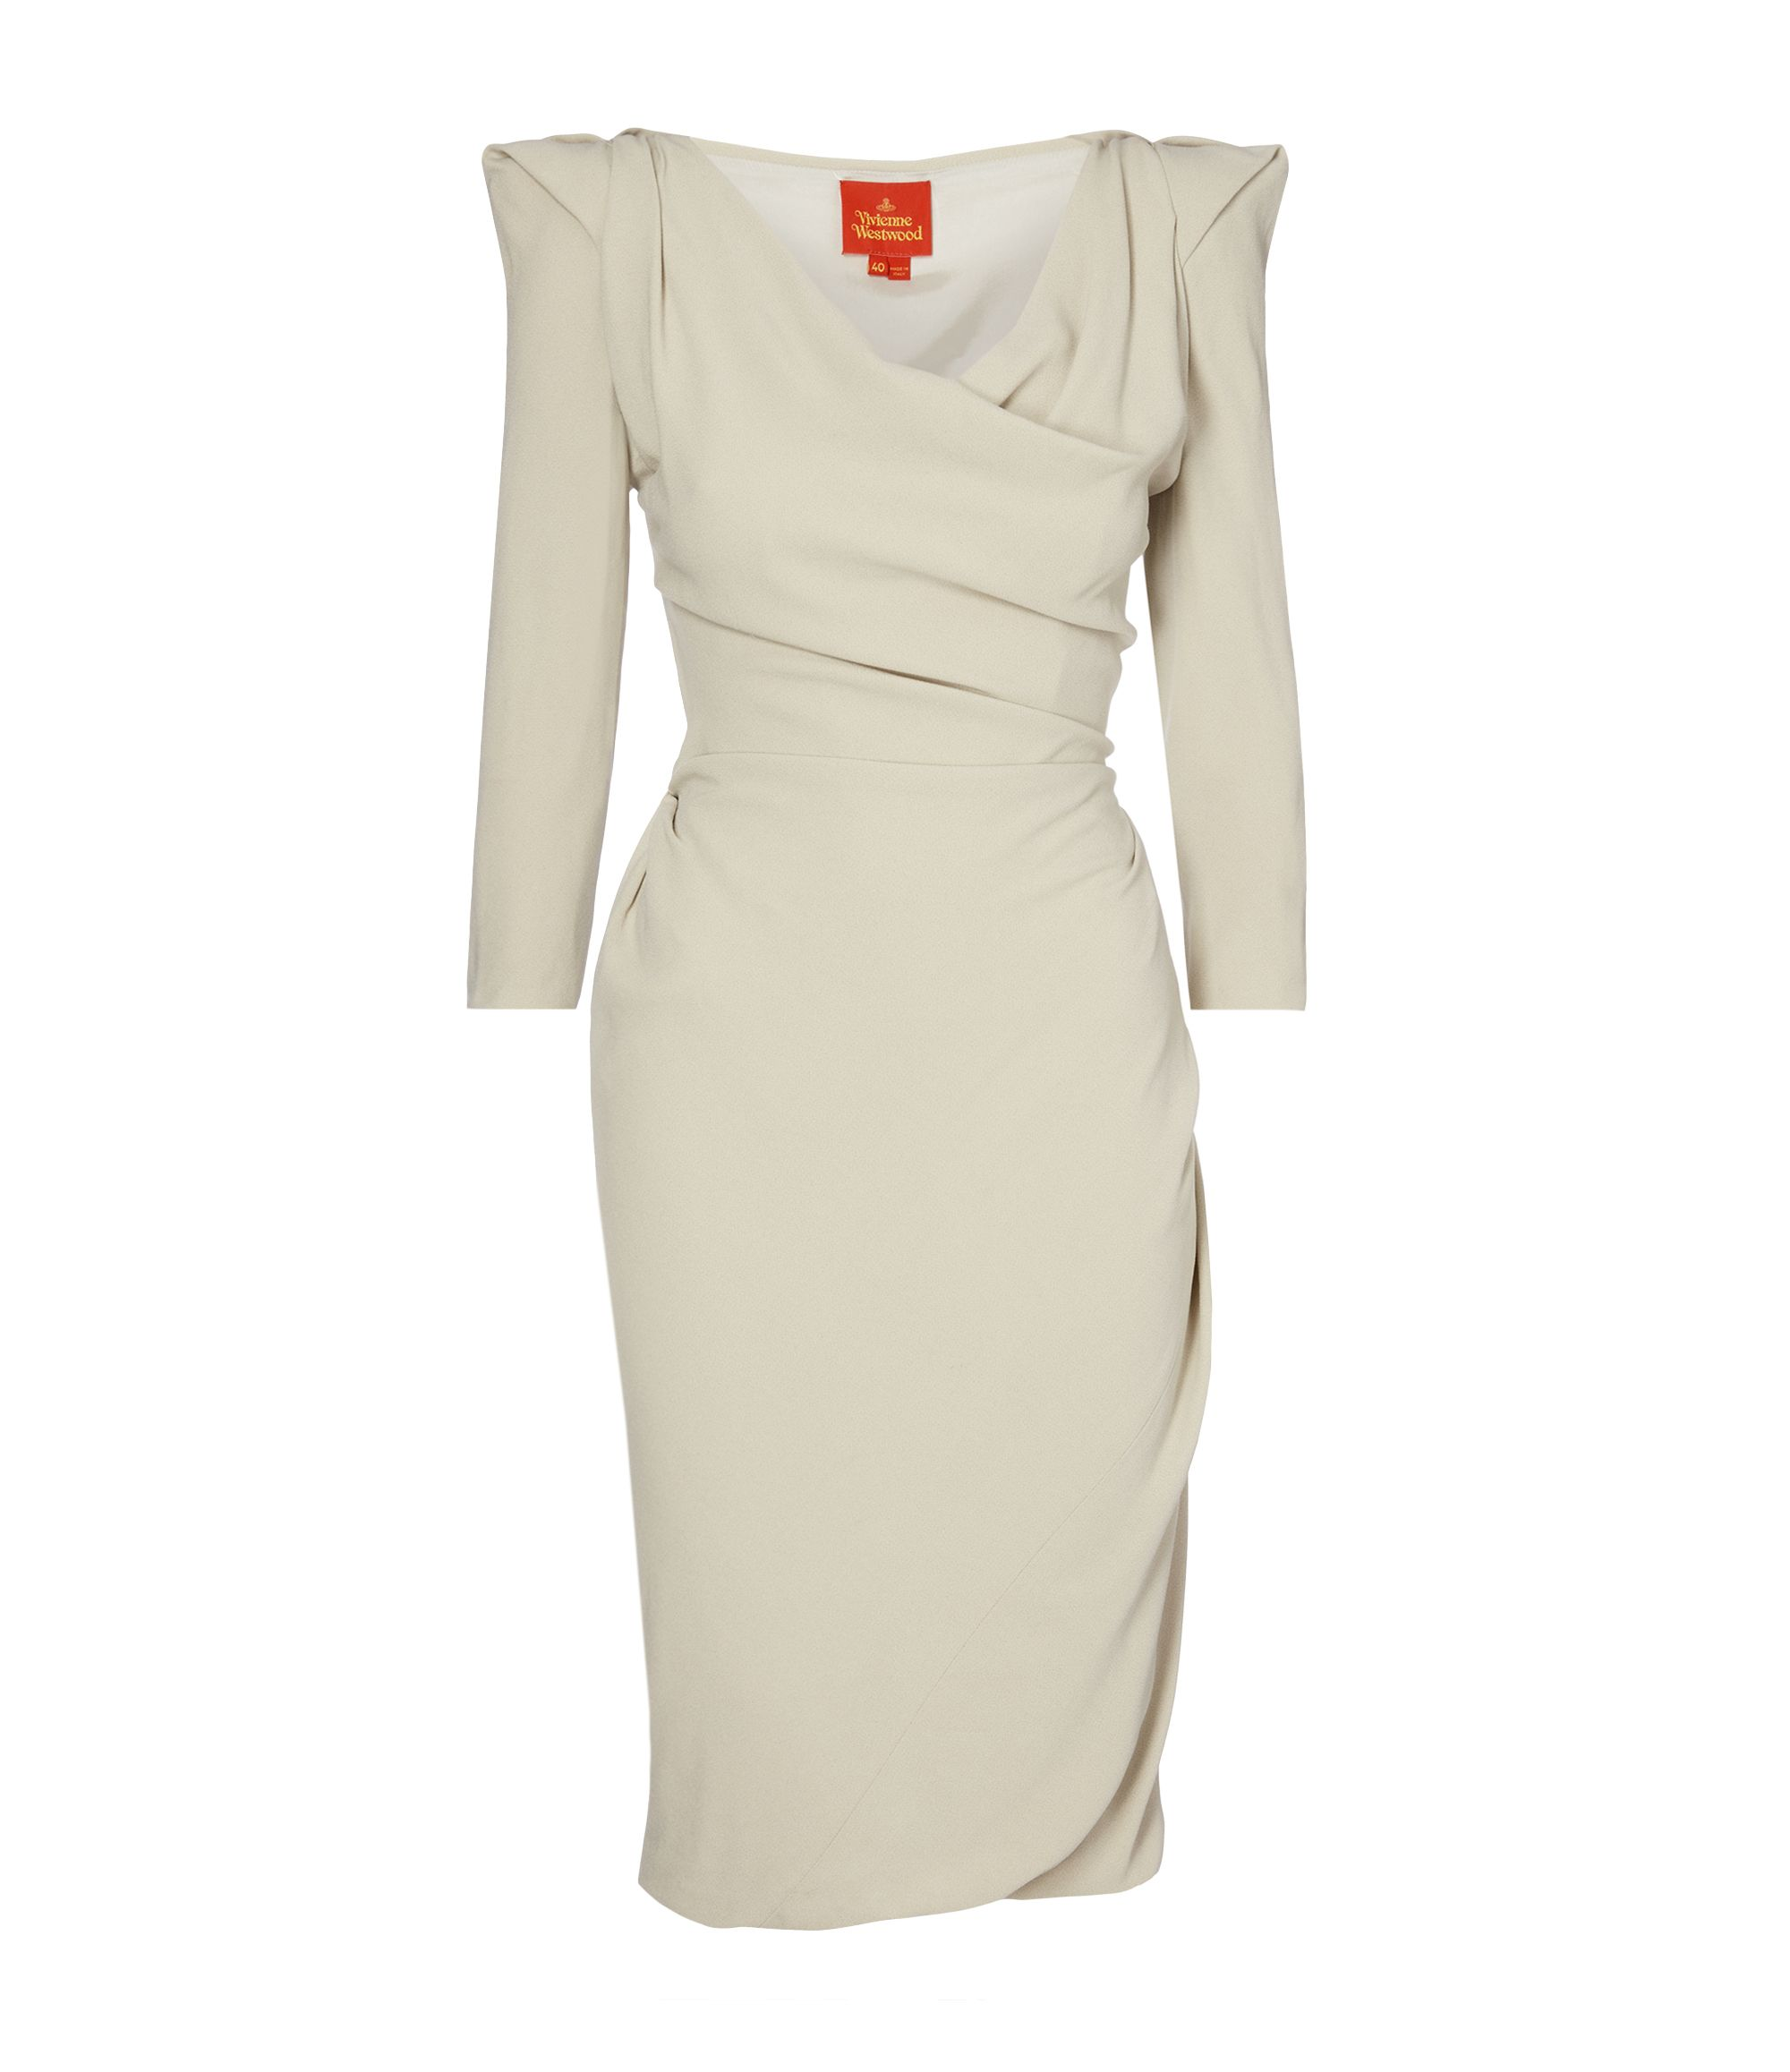 Vivienne Westwood Off White Short Amber Dress Viviennewestwood Cloth Dresses Pretty Outfits Event Dresses [ 2315 x 2000 Pixel ]